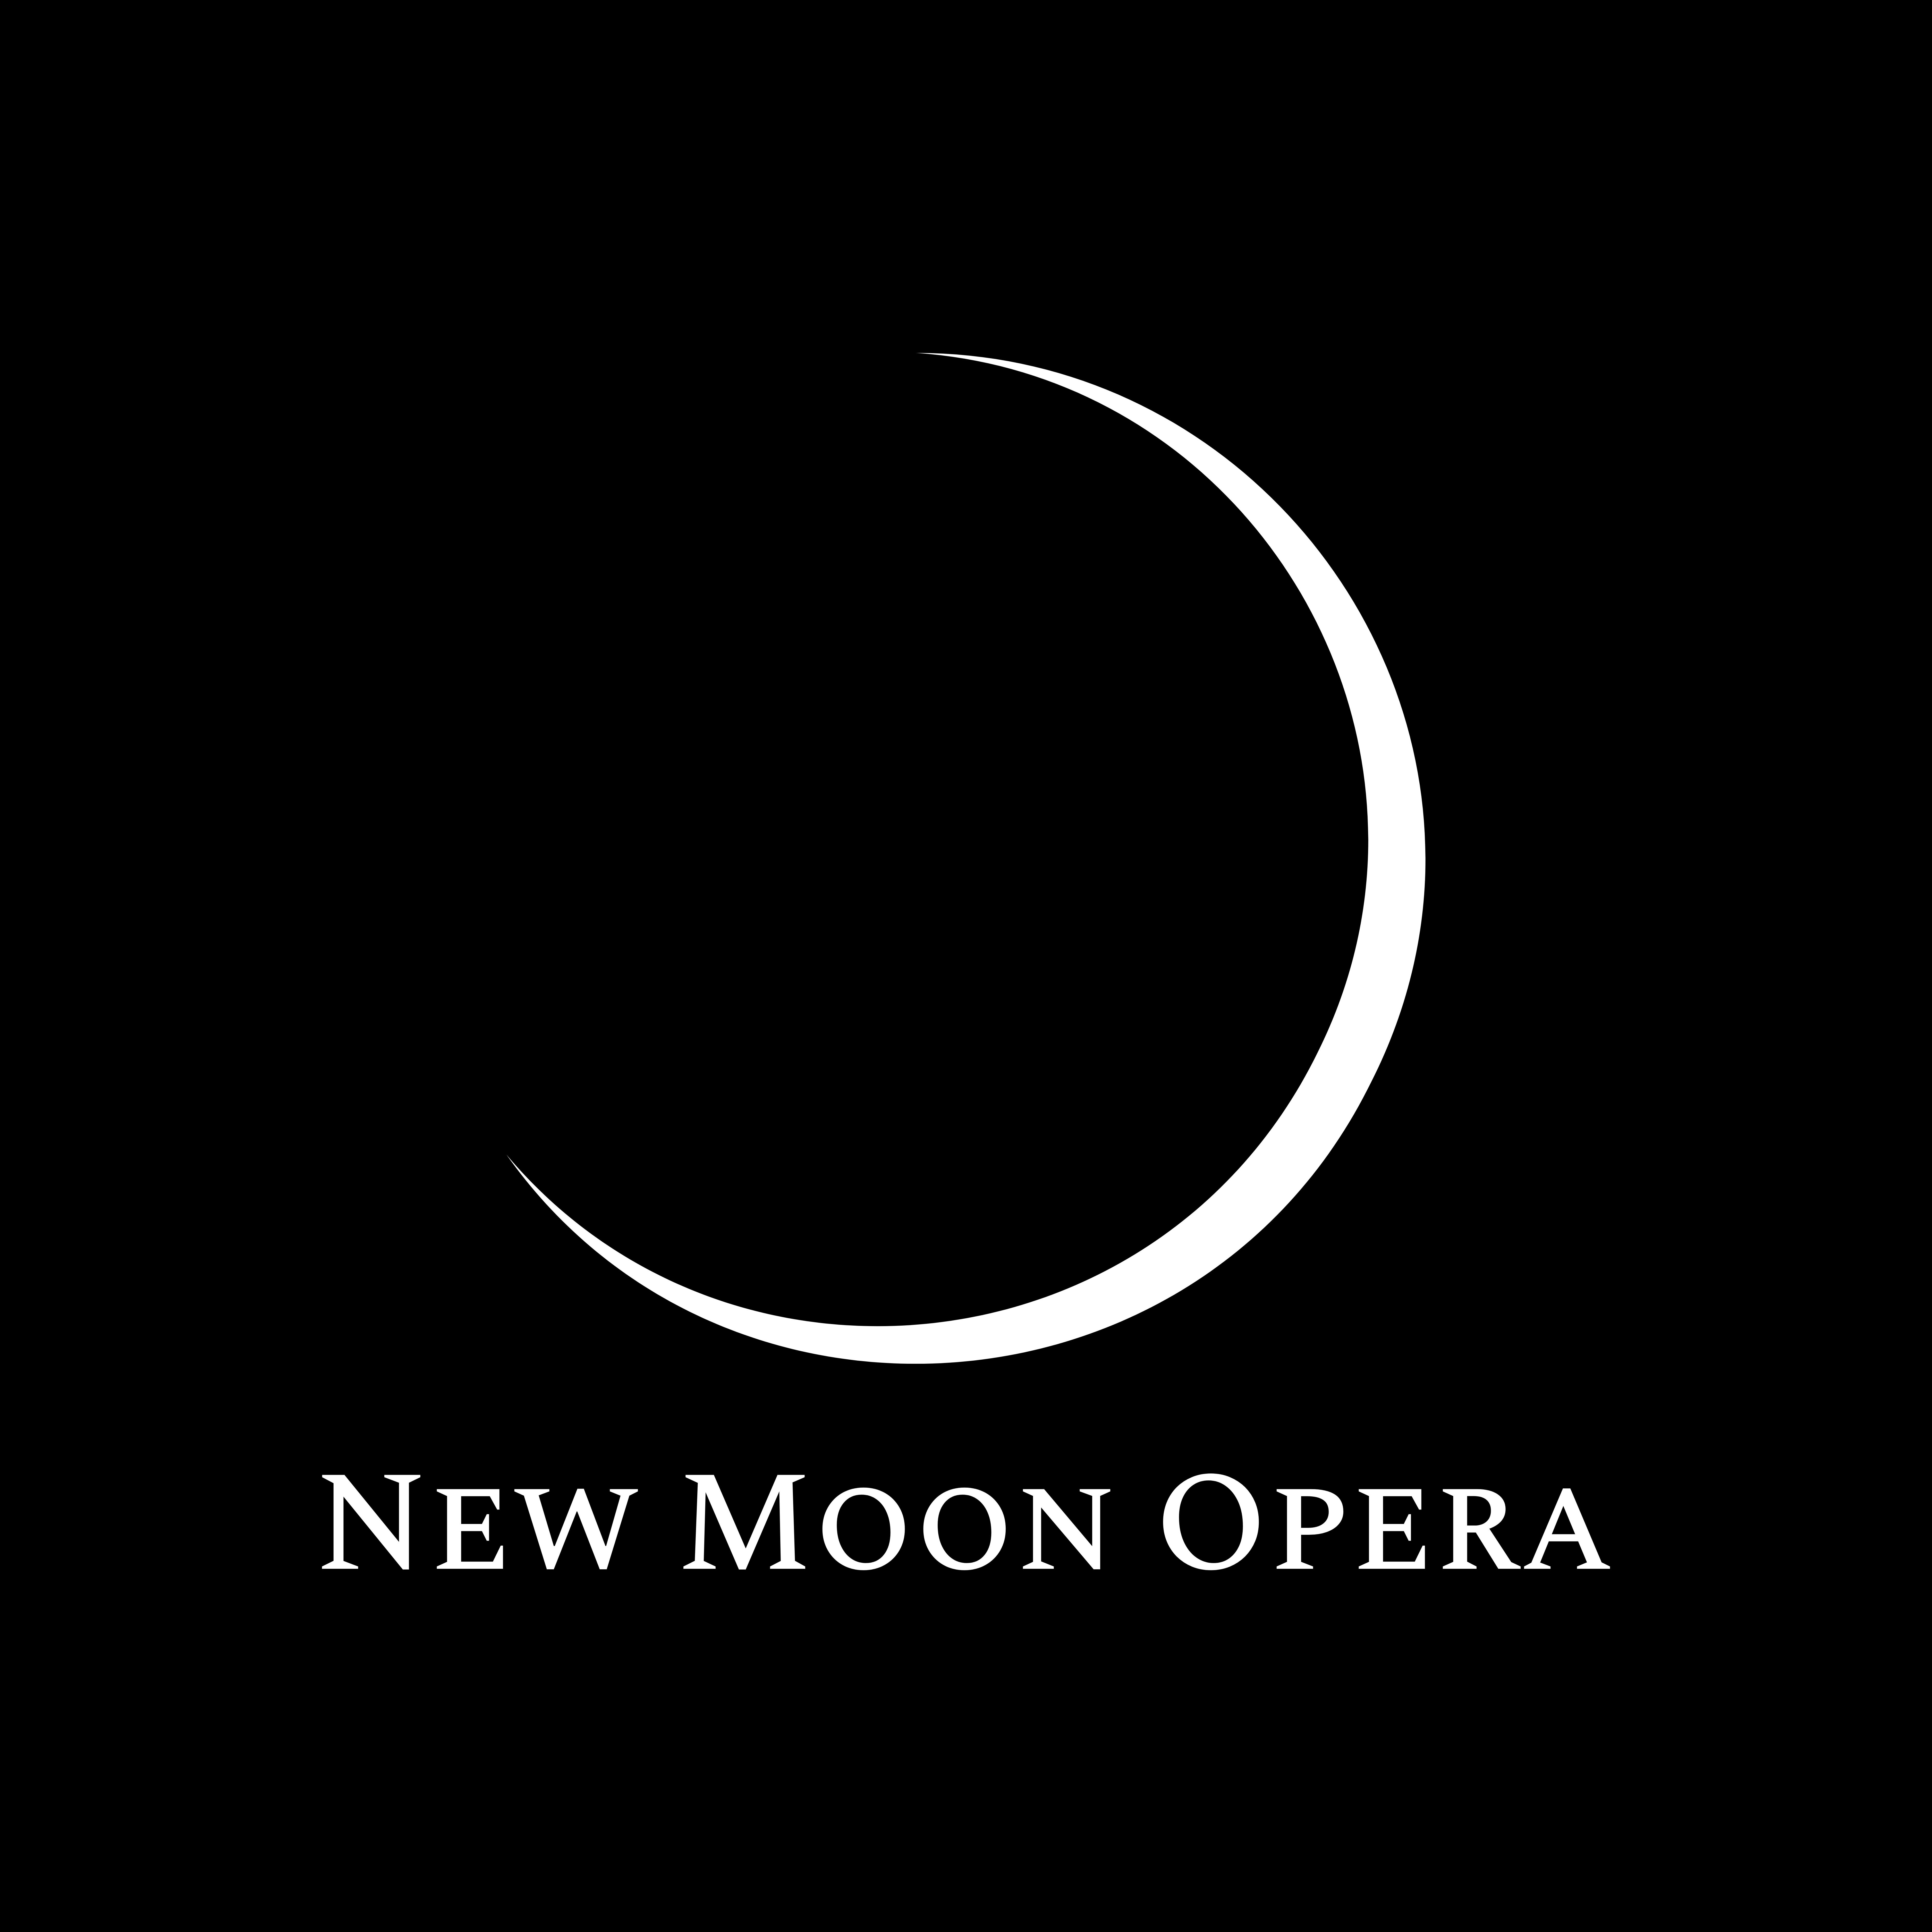 New Moon Opera